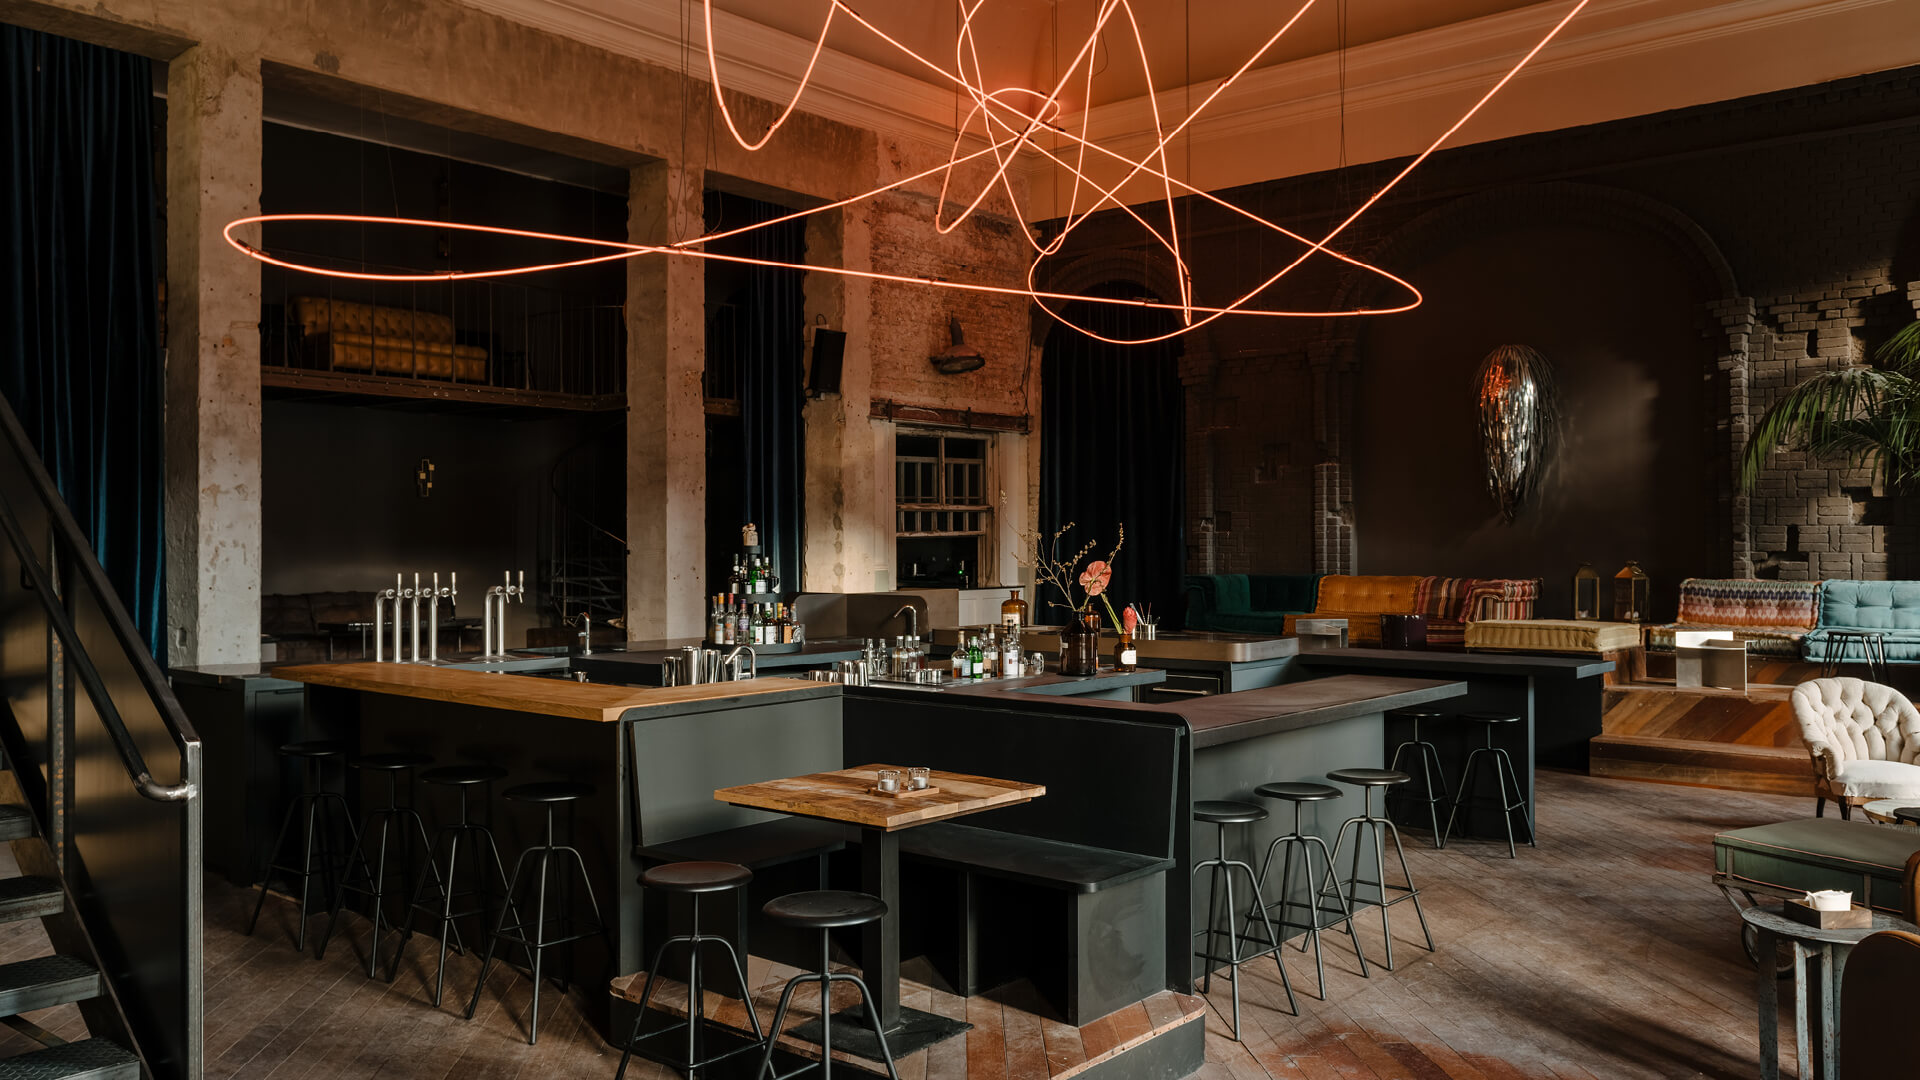 Inside KINK Bar and Restaurant in Berlin, Germany | KINK Bar and Restaurant by Oliver Mansaray and Daniel Scheppan | STIRworld